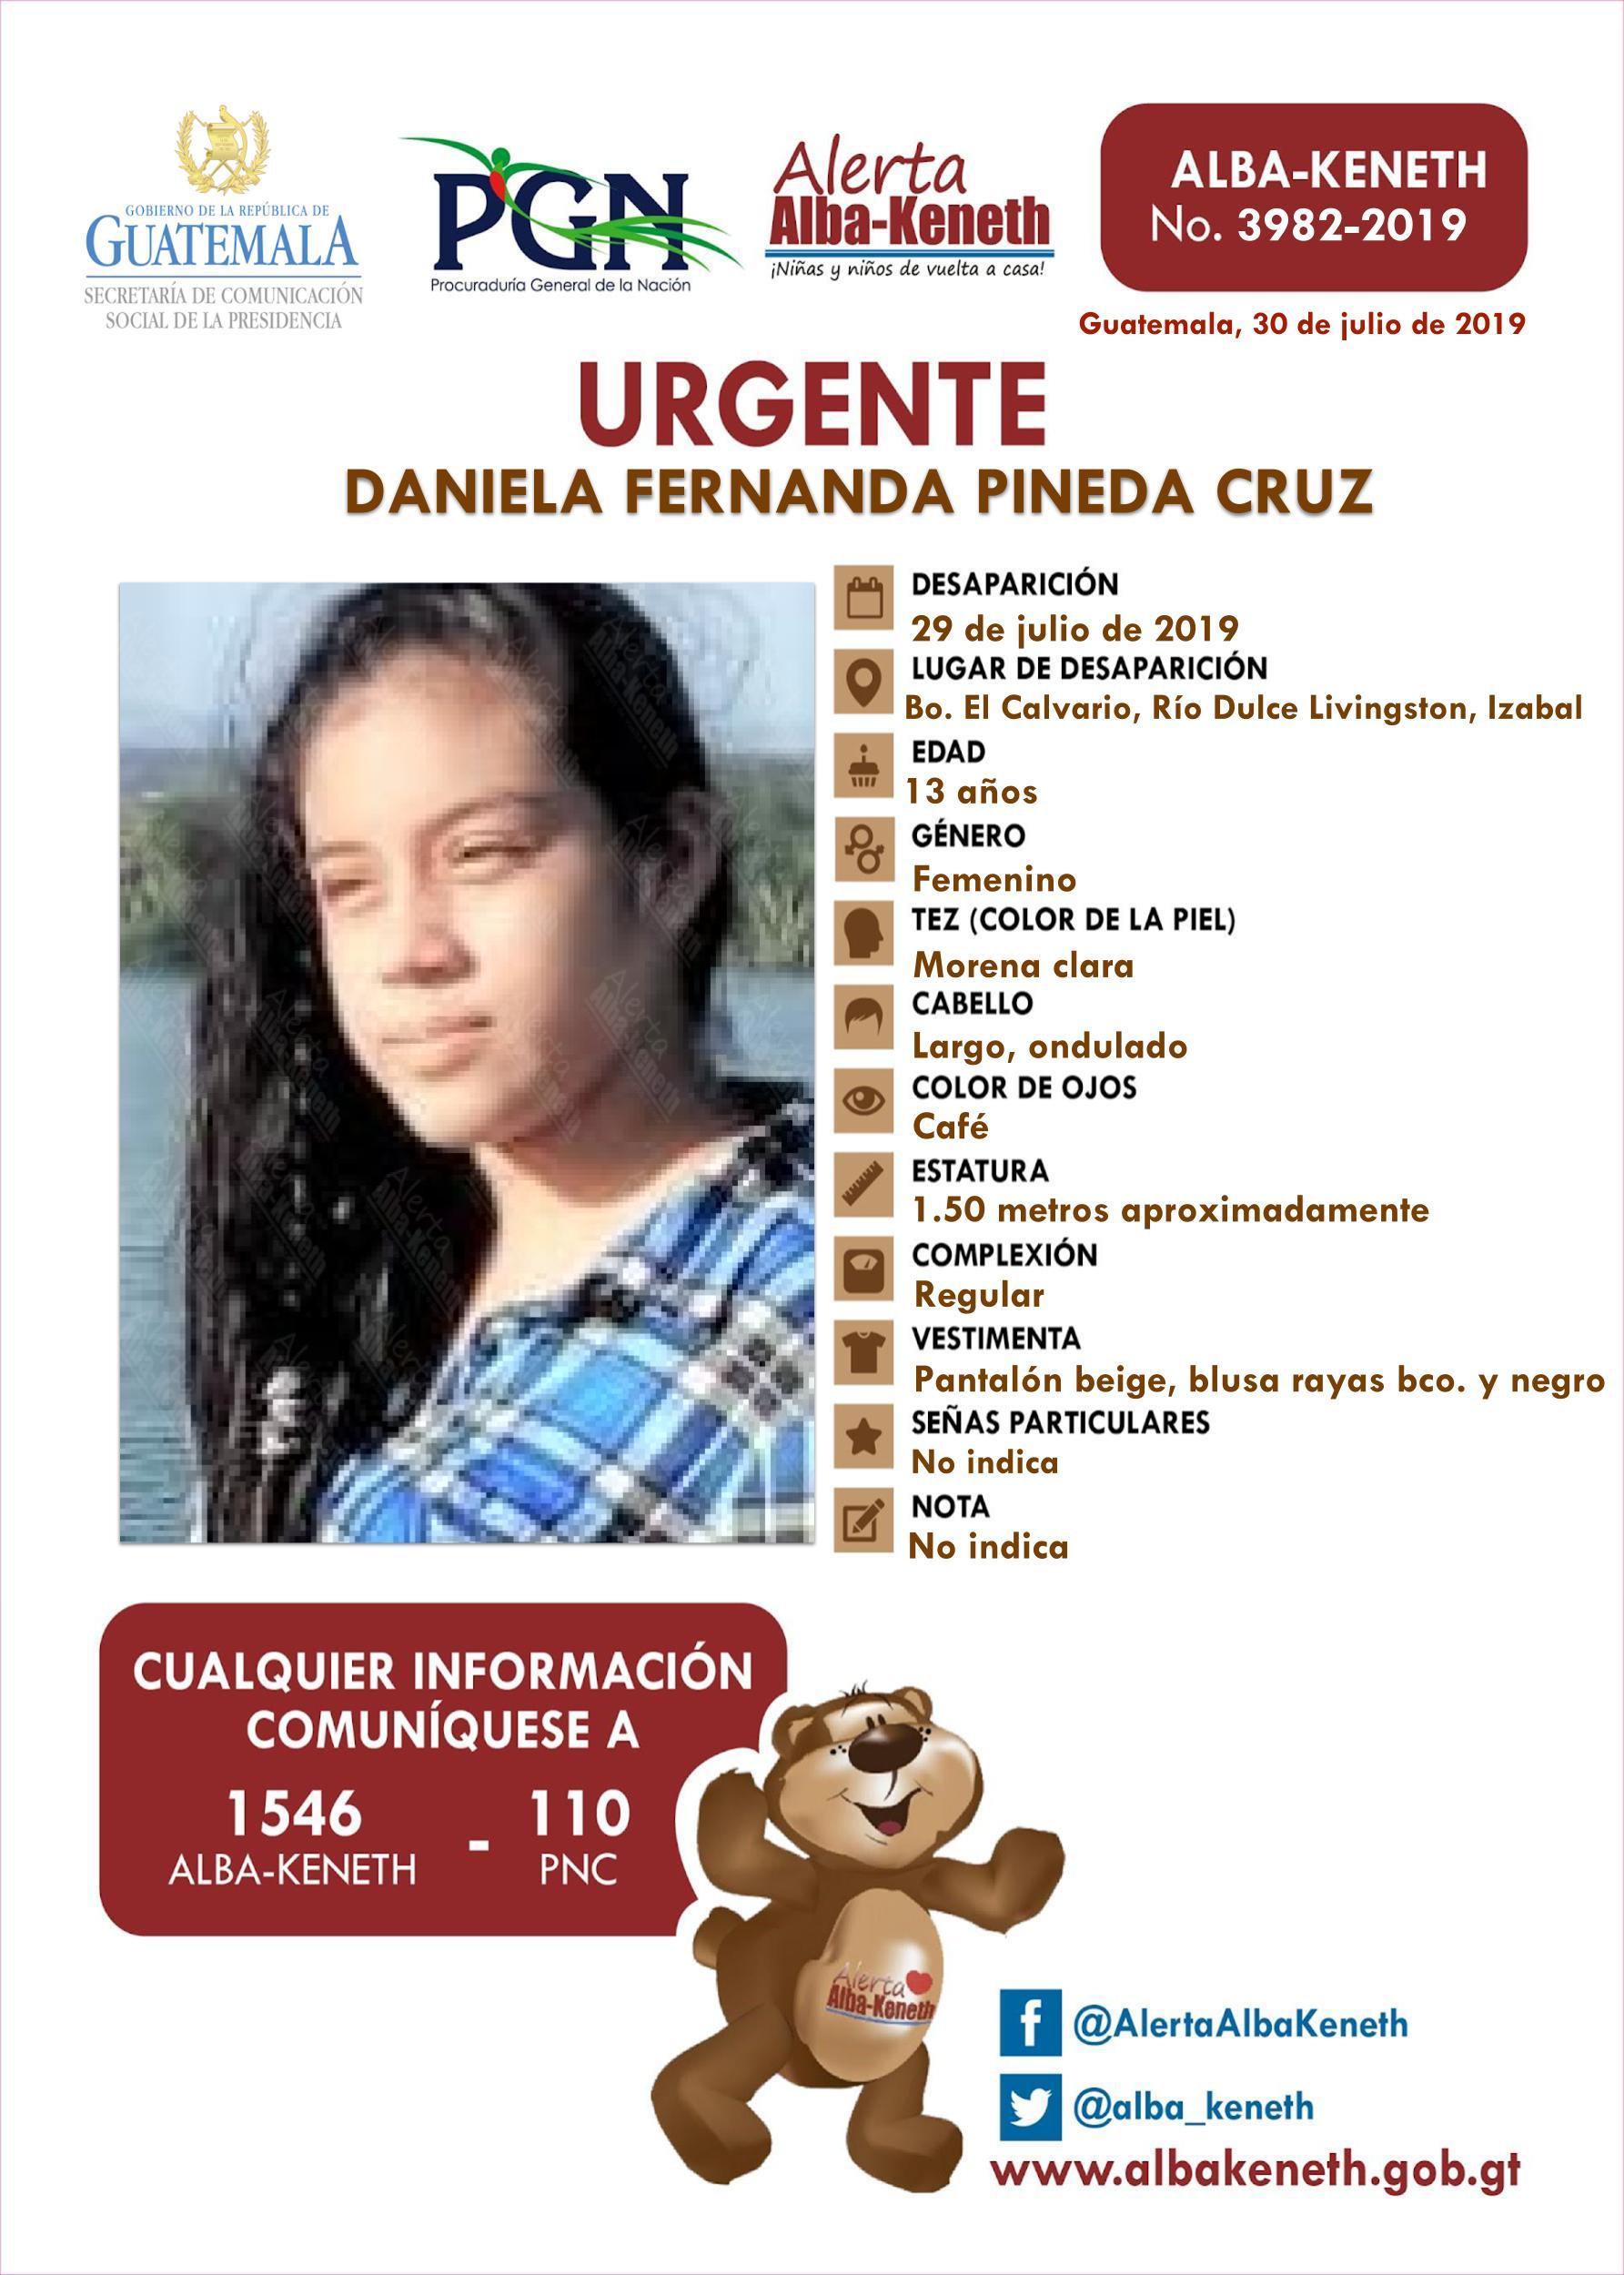 Daniela Fernanda Pineda Cruz